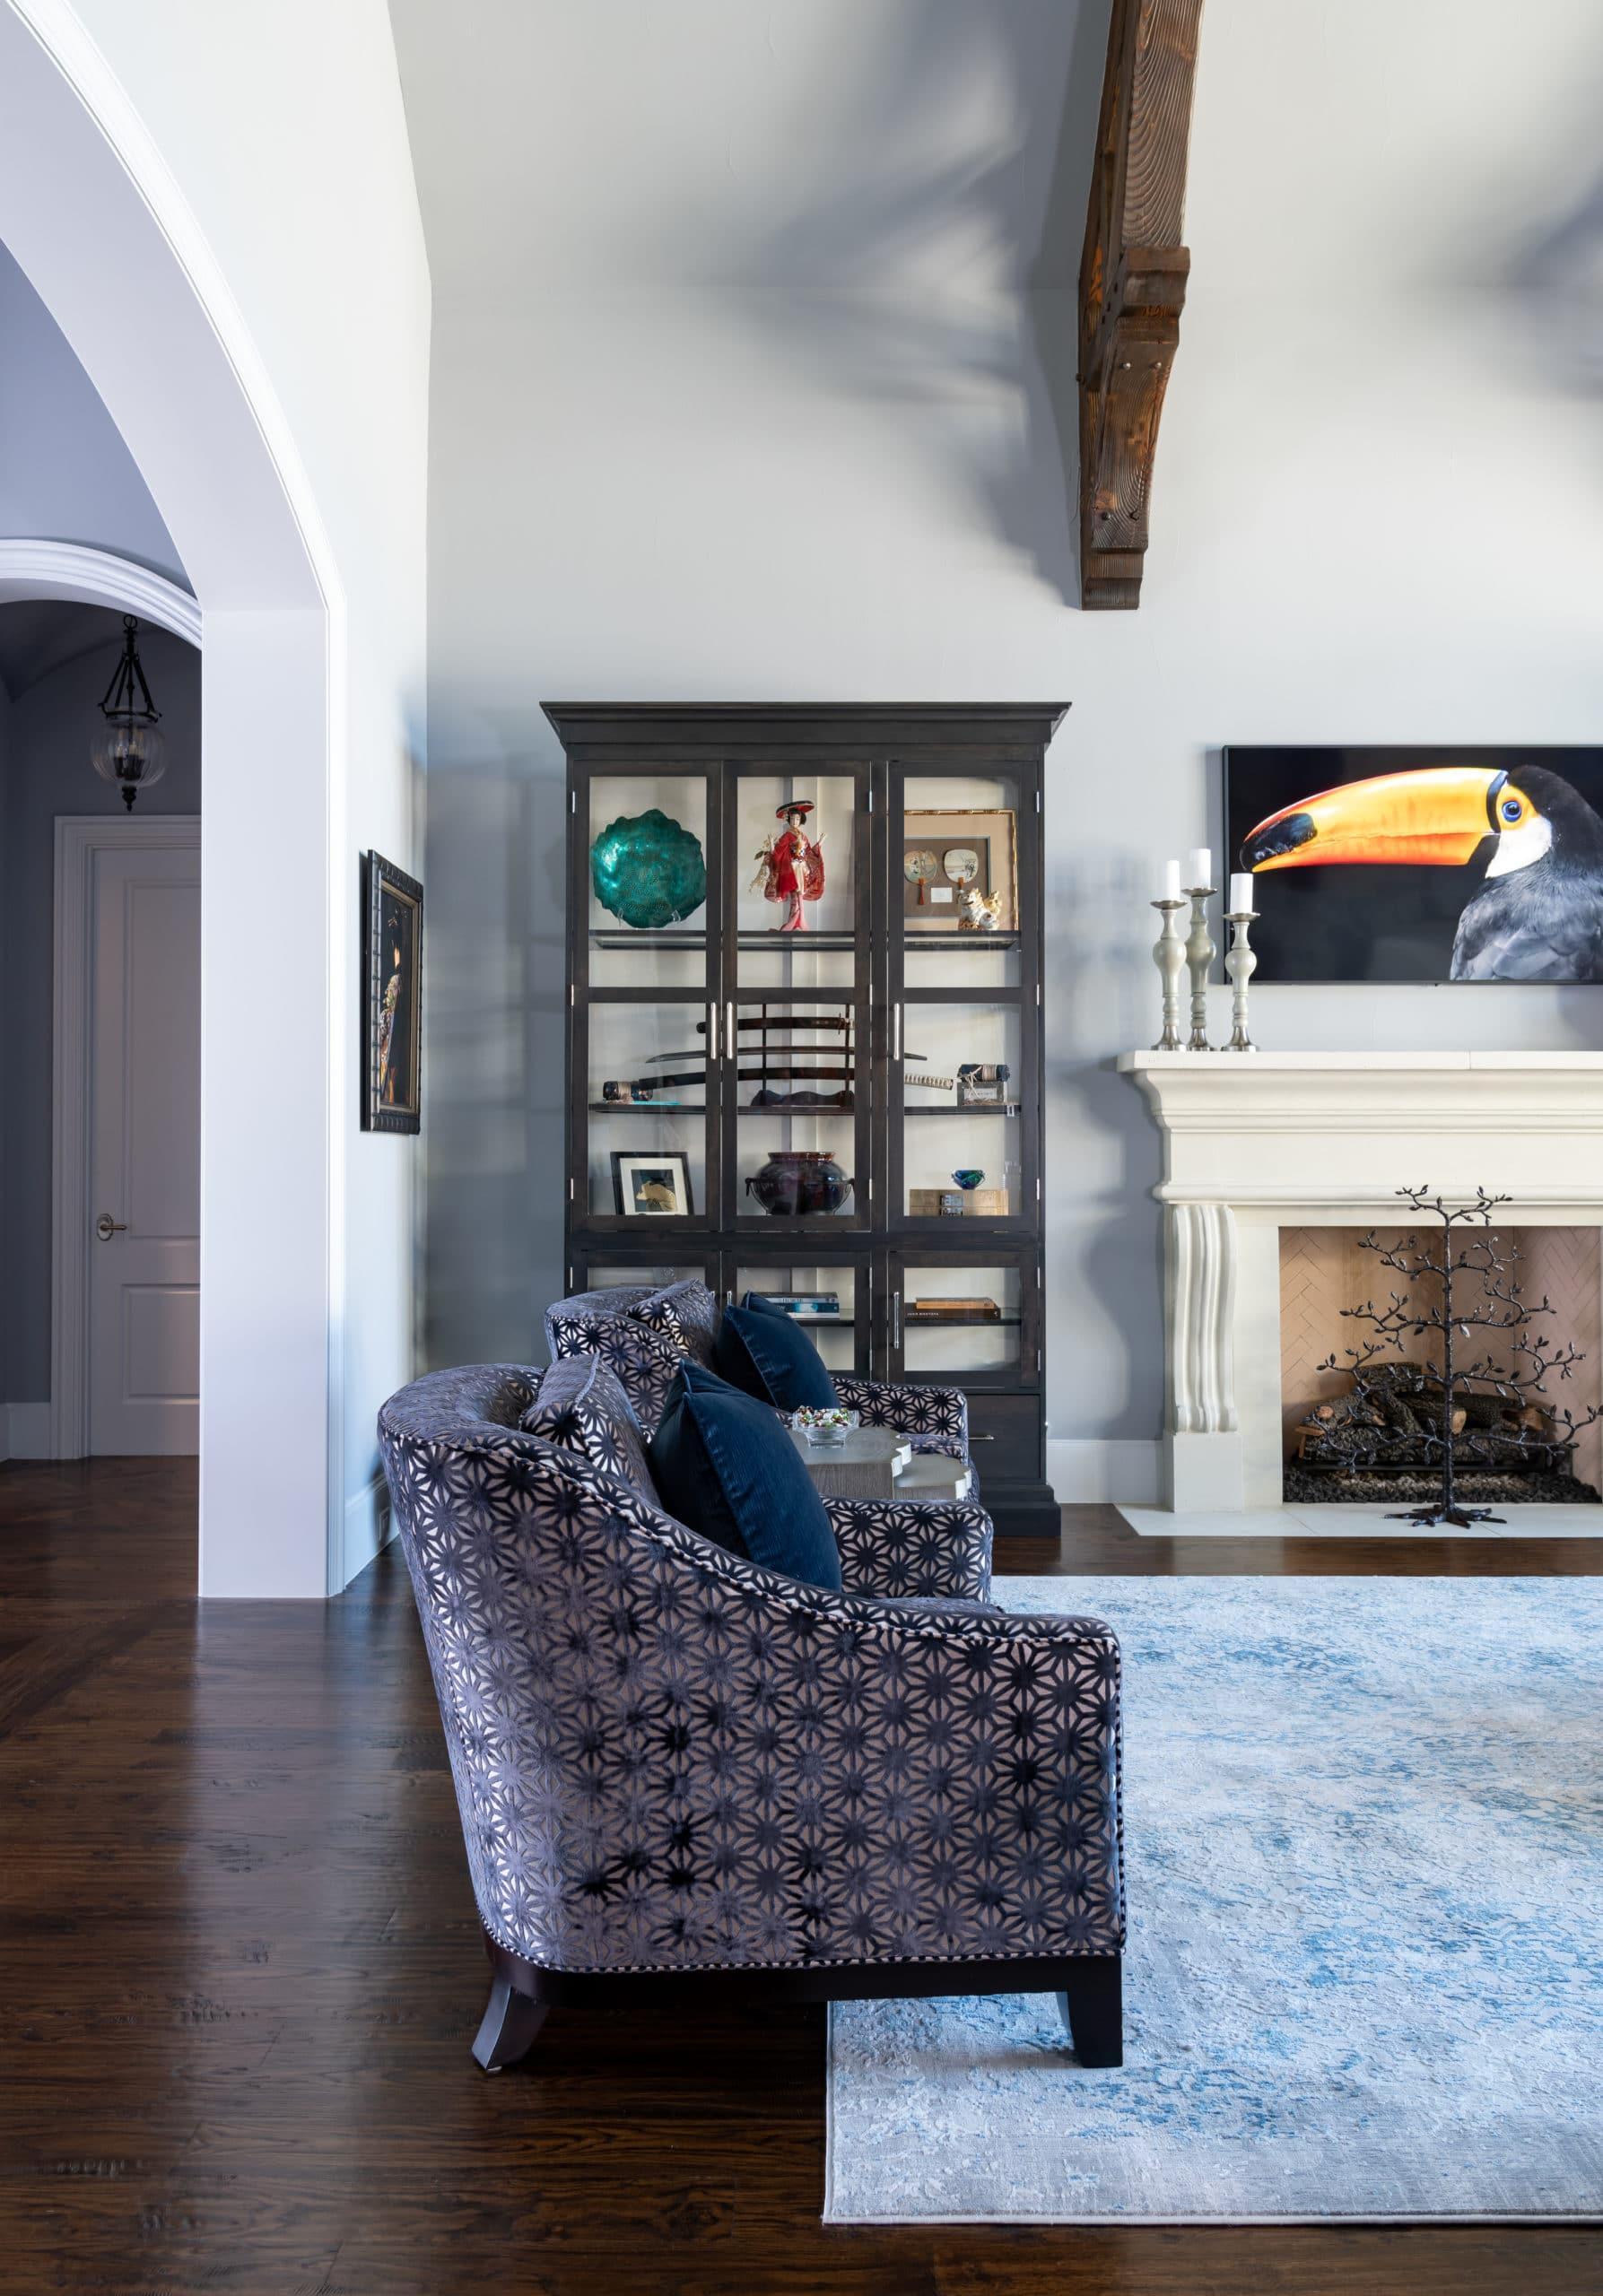 Home Tours 4 | Award-Winning Interior Designers, Interior Decorators, Kitchen Designers, Bath Designers, Home Renovations, Window Treatments, & Custom Furniture D'KOR HOME by Dee Frazier Interiors | Interior Designer Dallas TX